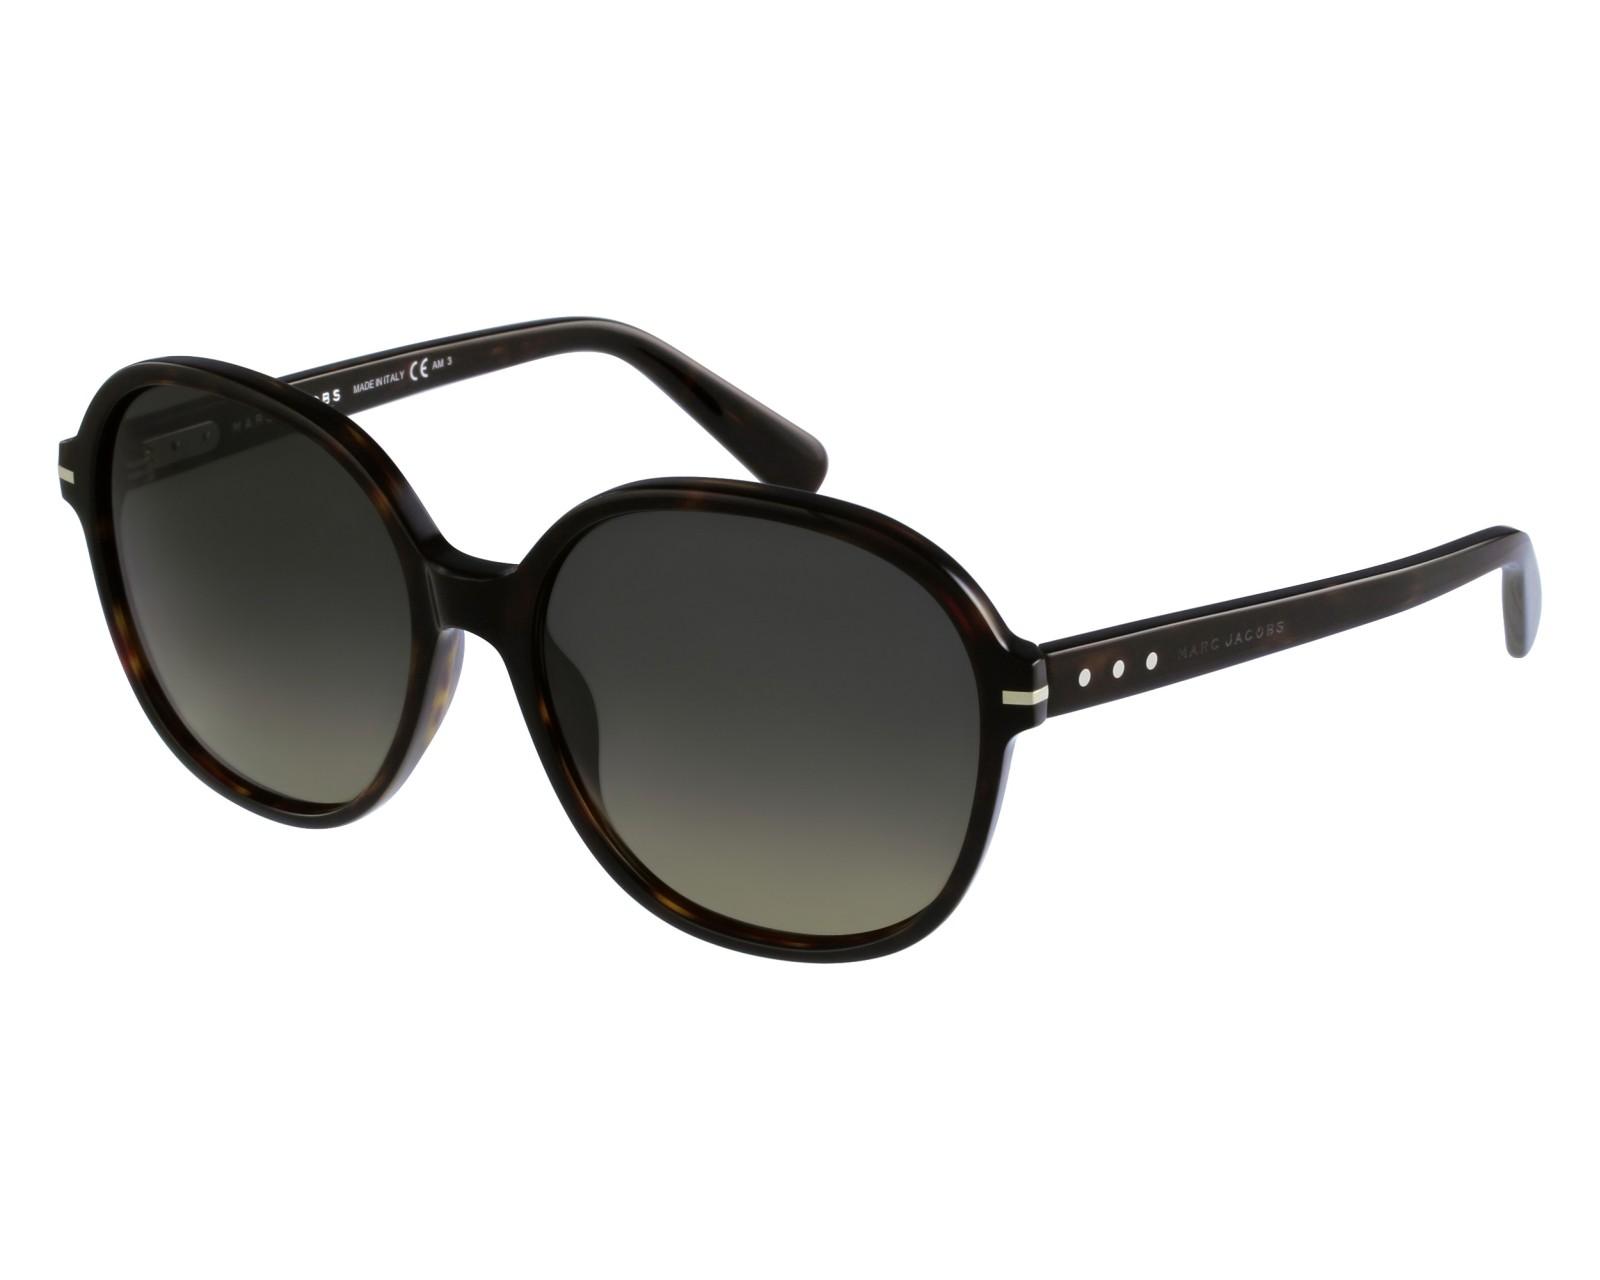 Marc Jacobs Sonnenbrille MJ 563/S R4 DARK HAVANA, 57